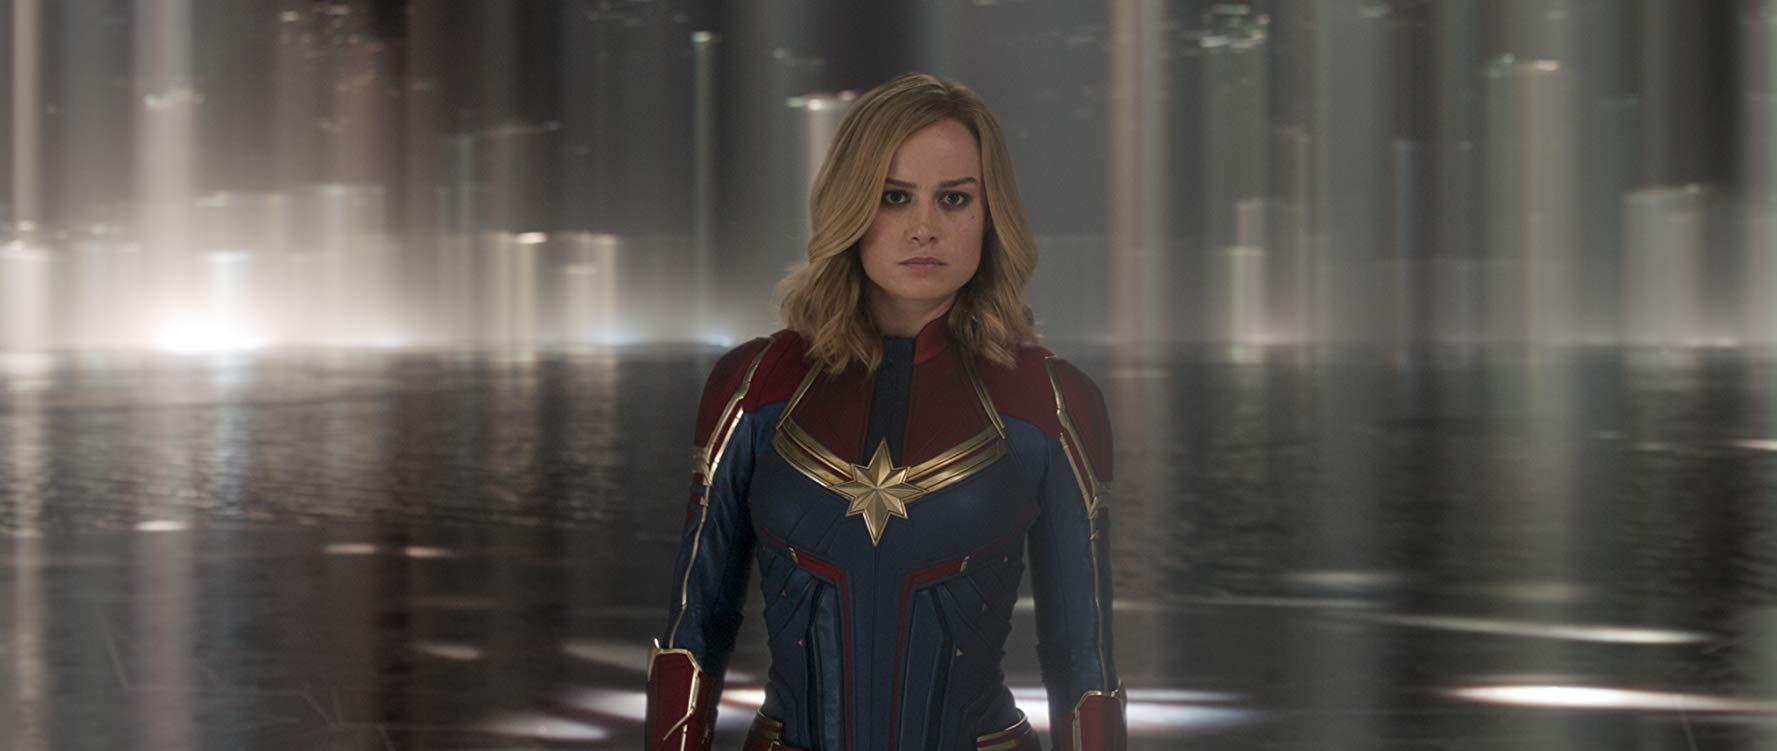 Reseña de la película Capitana Marvel - Captain Marvel (2019)